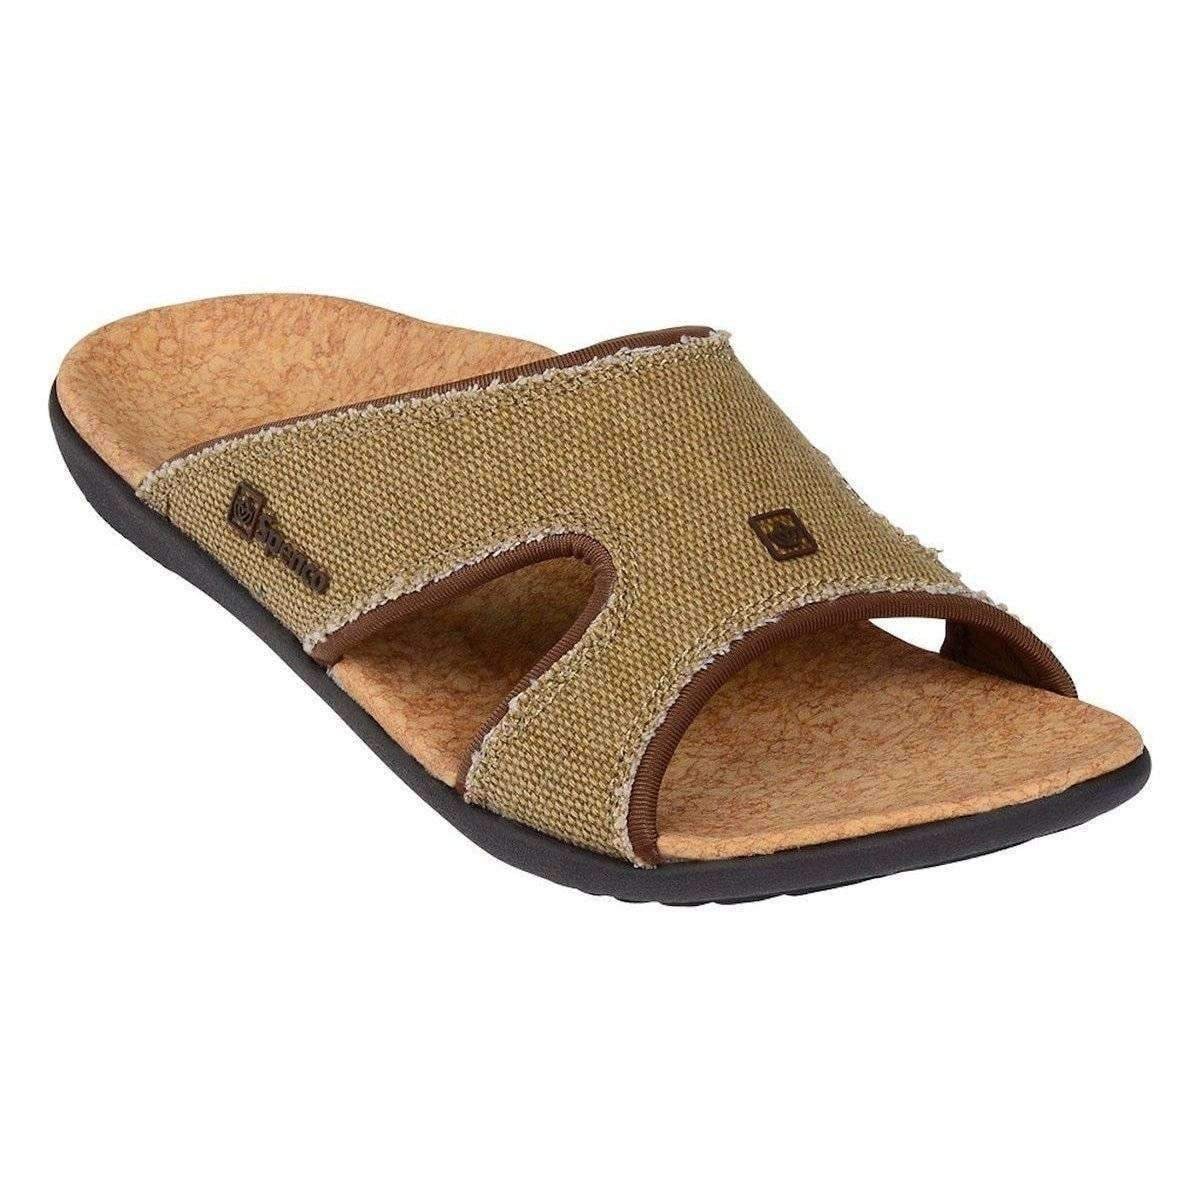 Black Spenco Women/'s Tora Strappy Sandals